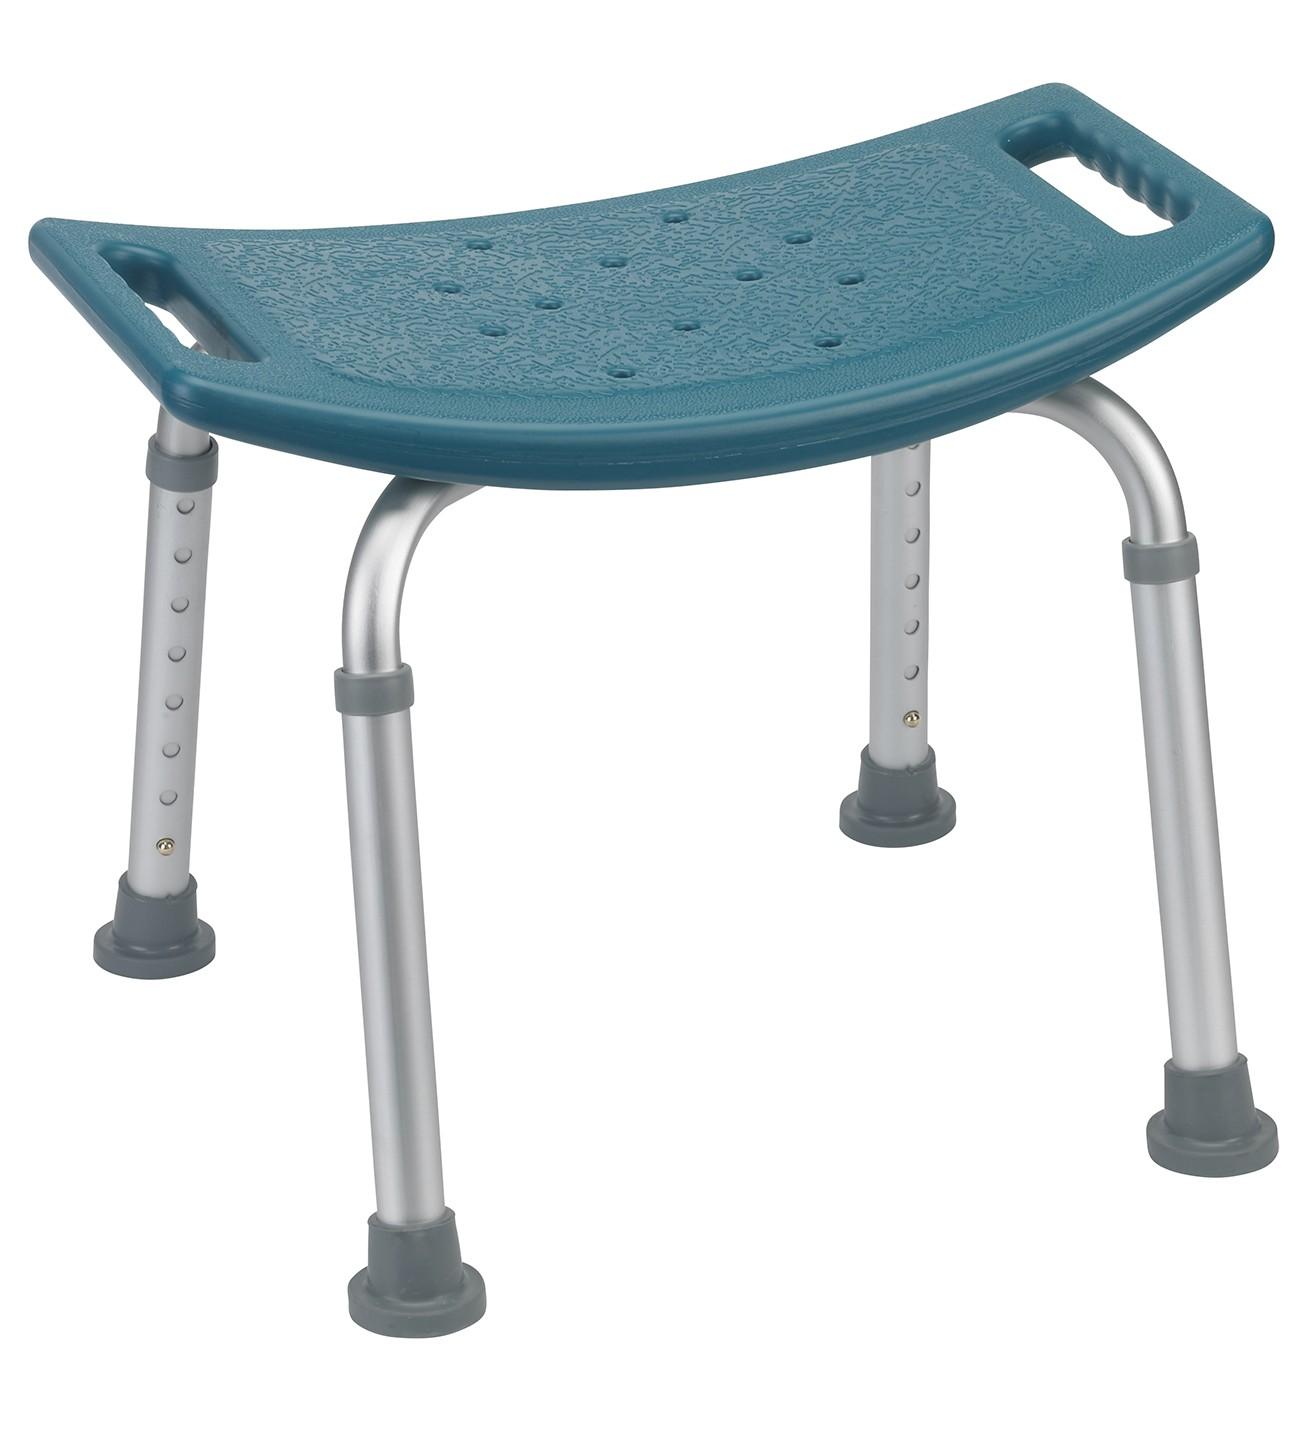 bathroom_safety_bench_chair1.jpg